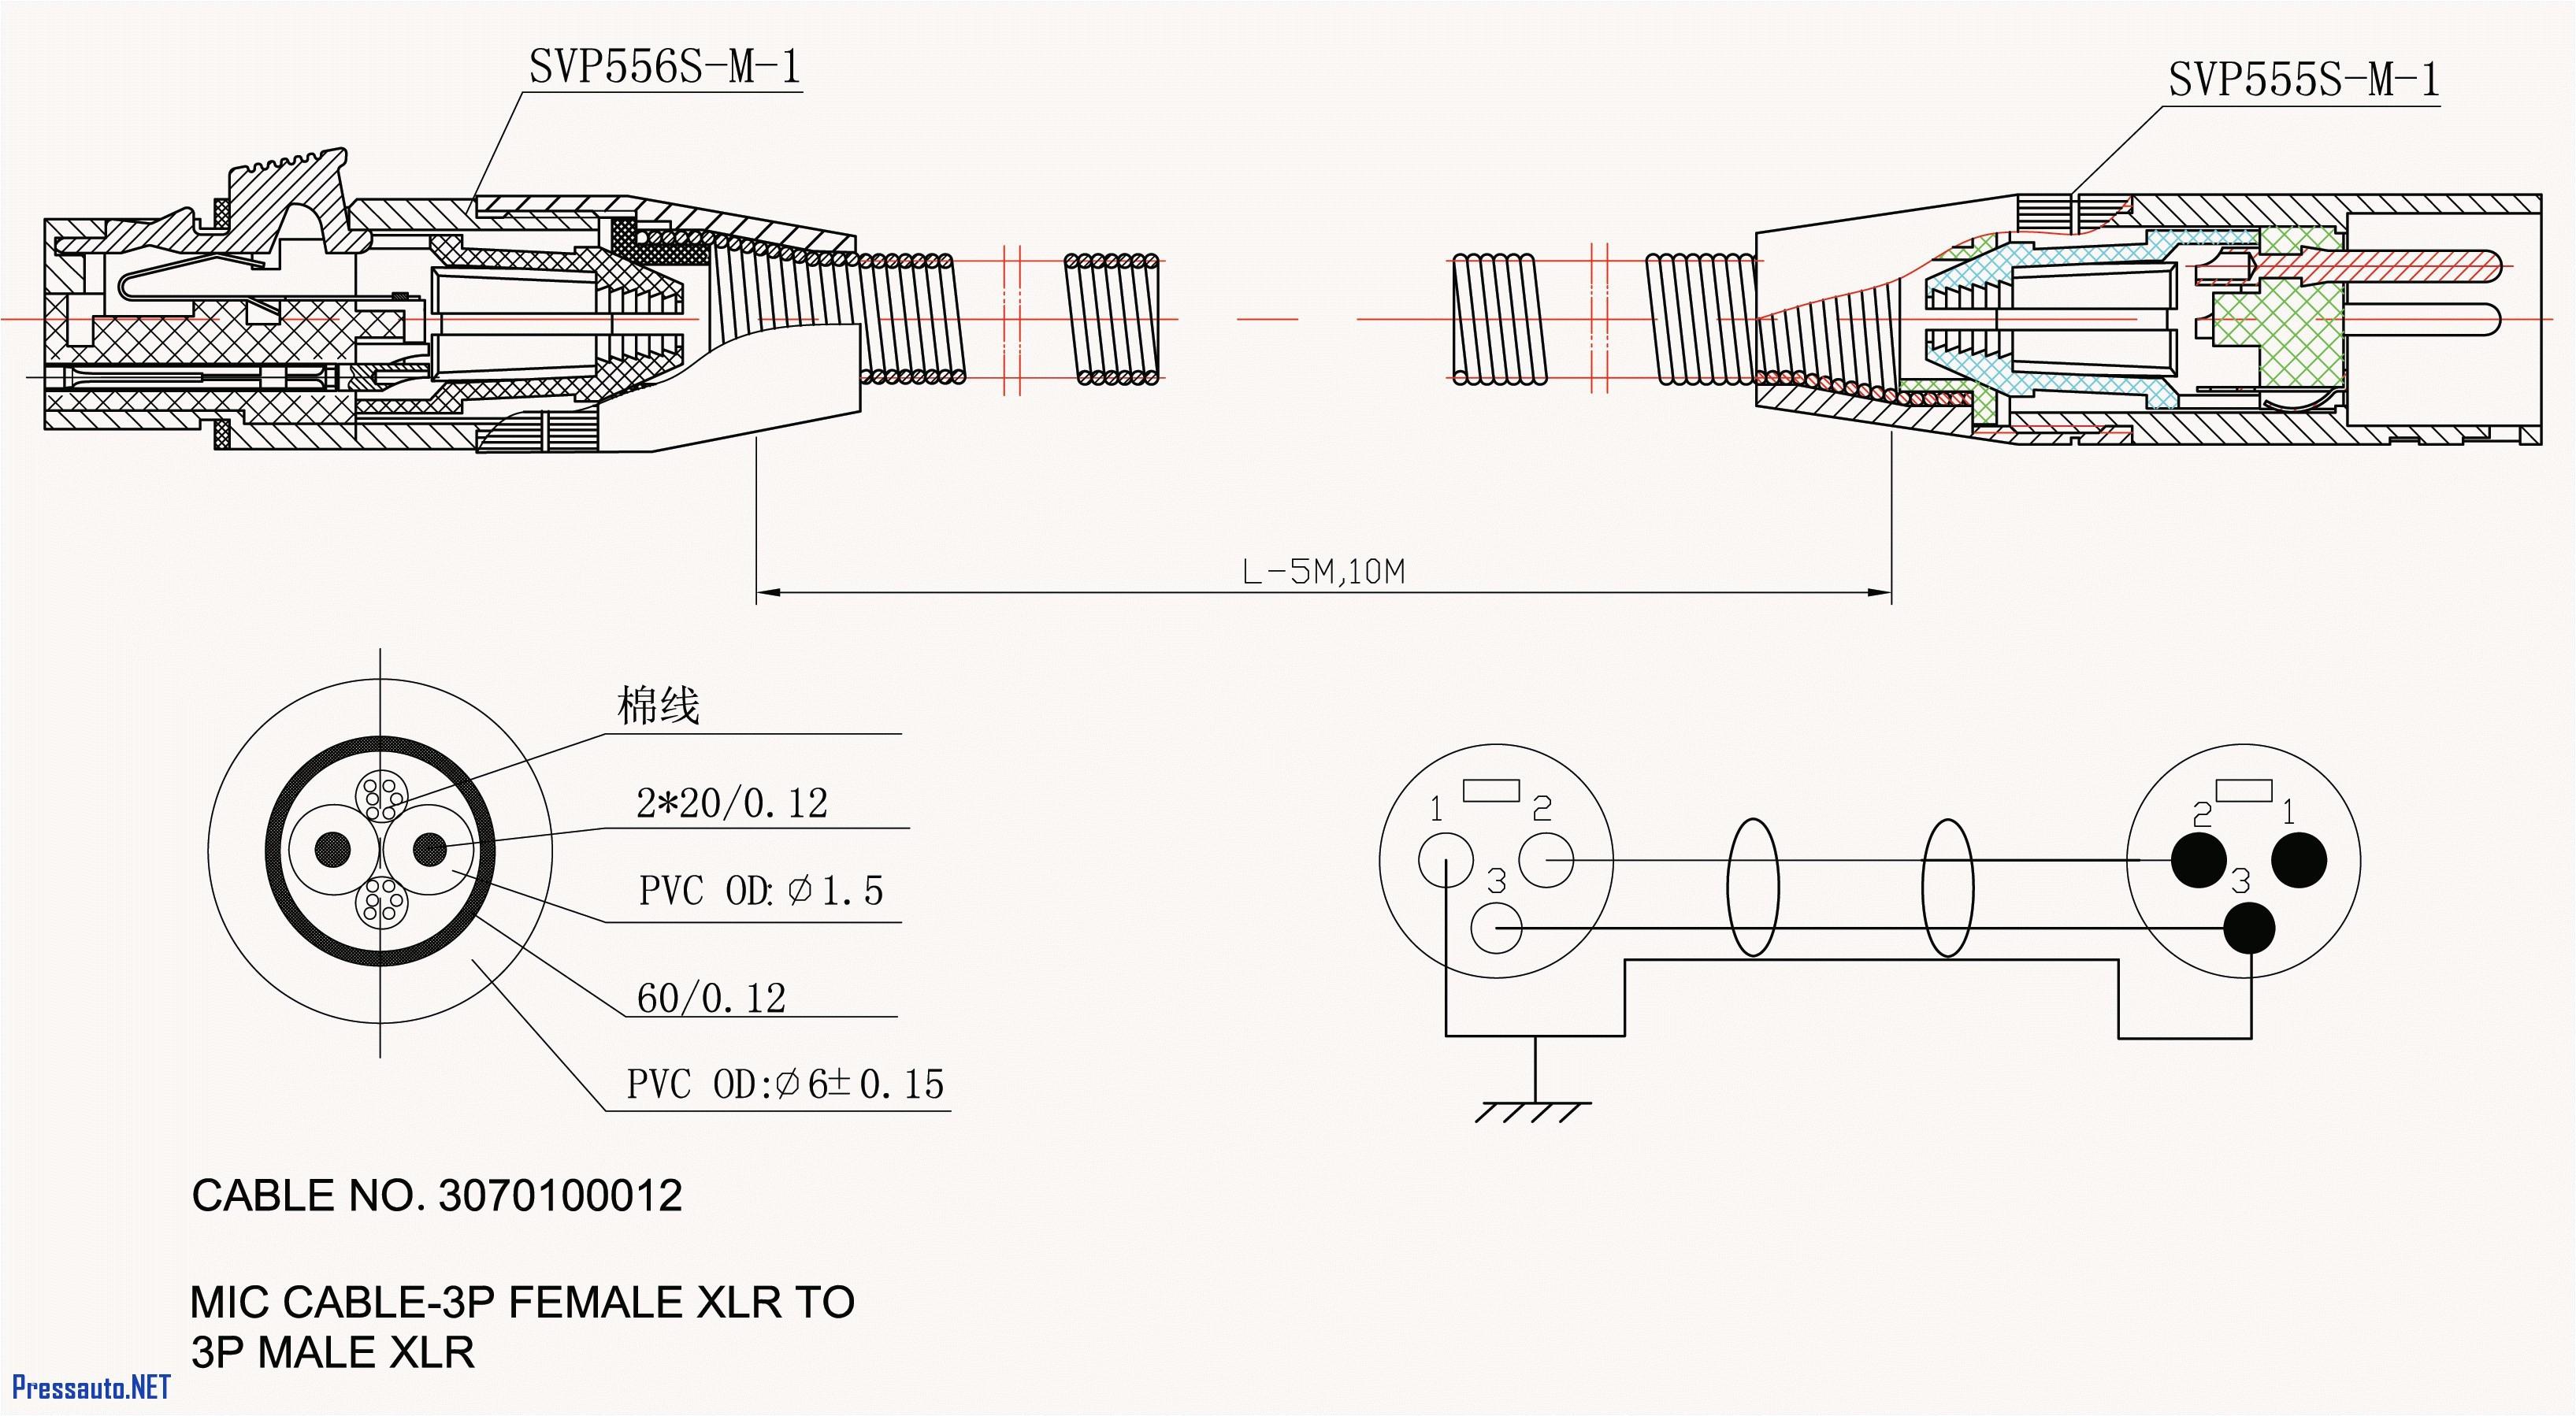 gfci breaker wiring diagram unique residential bathroom gfci circuitgfci breaker wiring diagram unique residential bathroom gfci